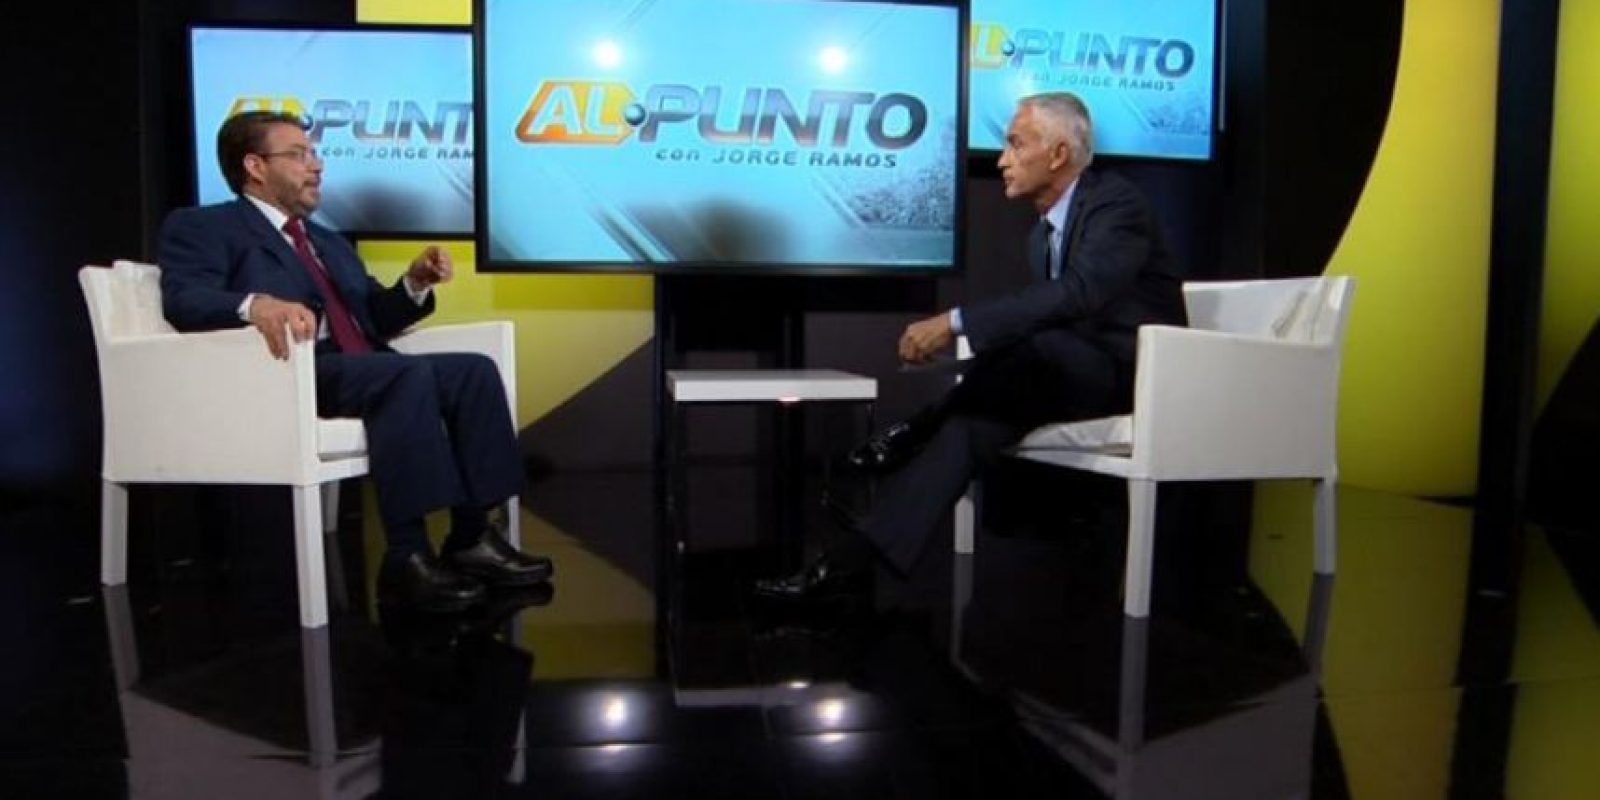 Foto:Vía Twitter.com/jorgeramosnews